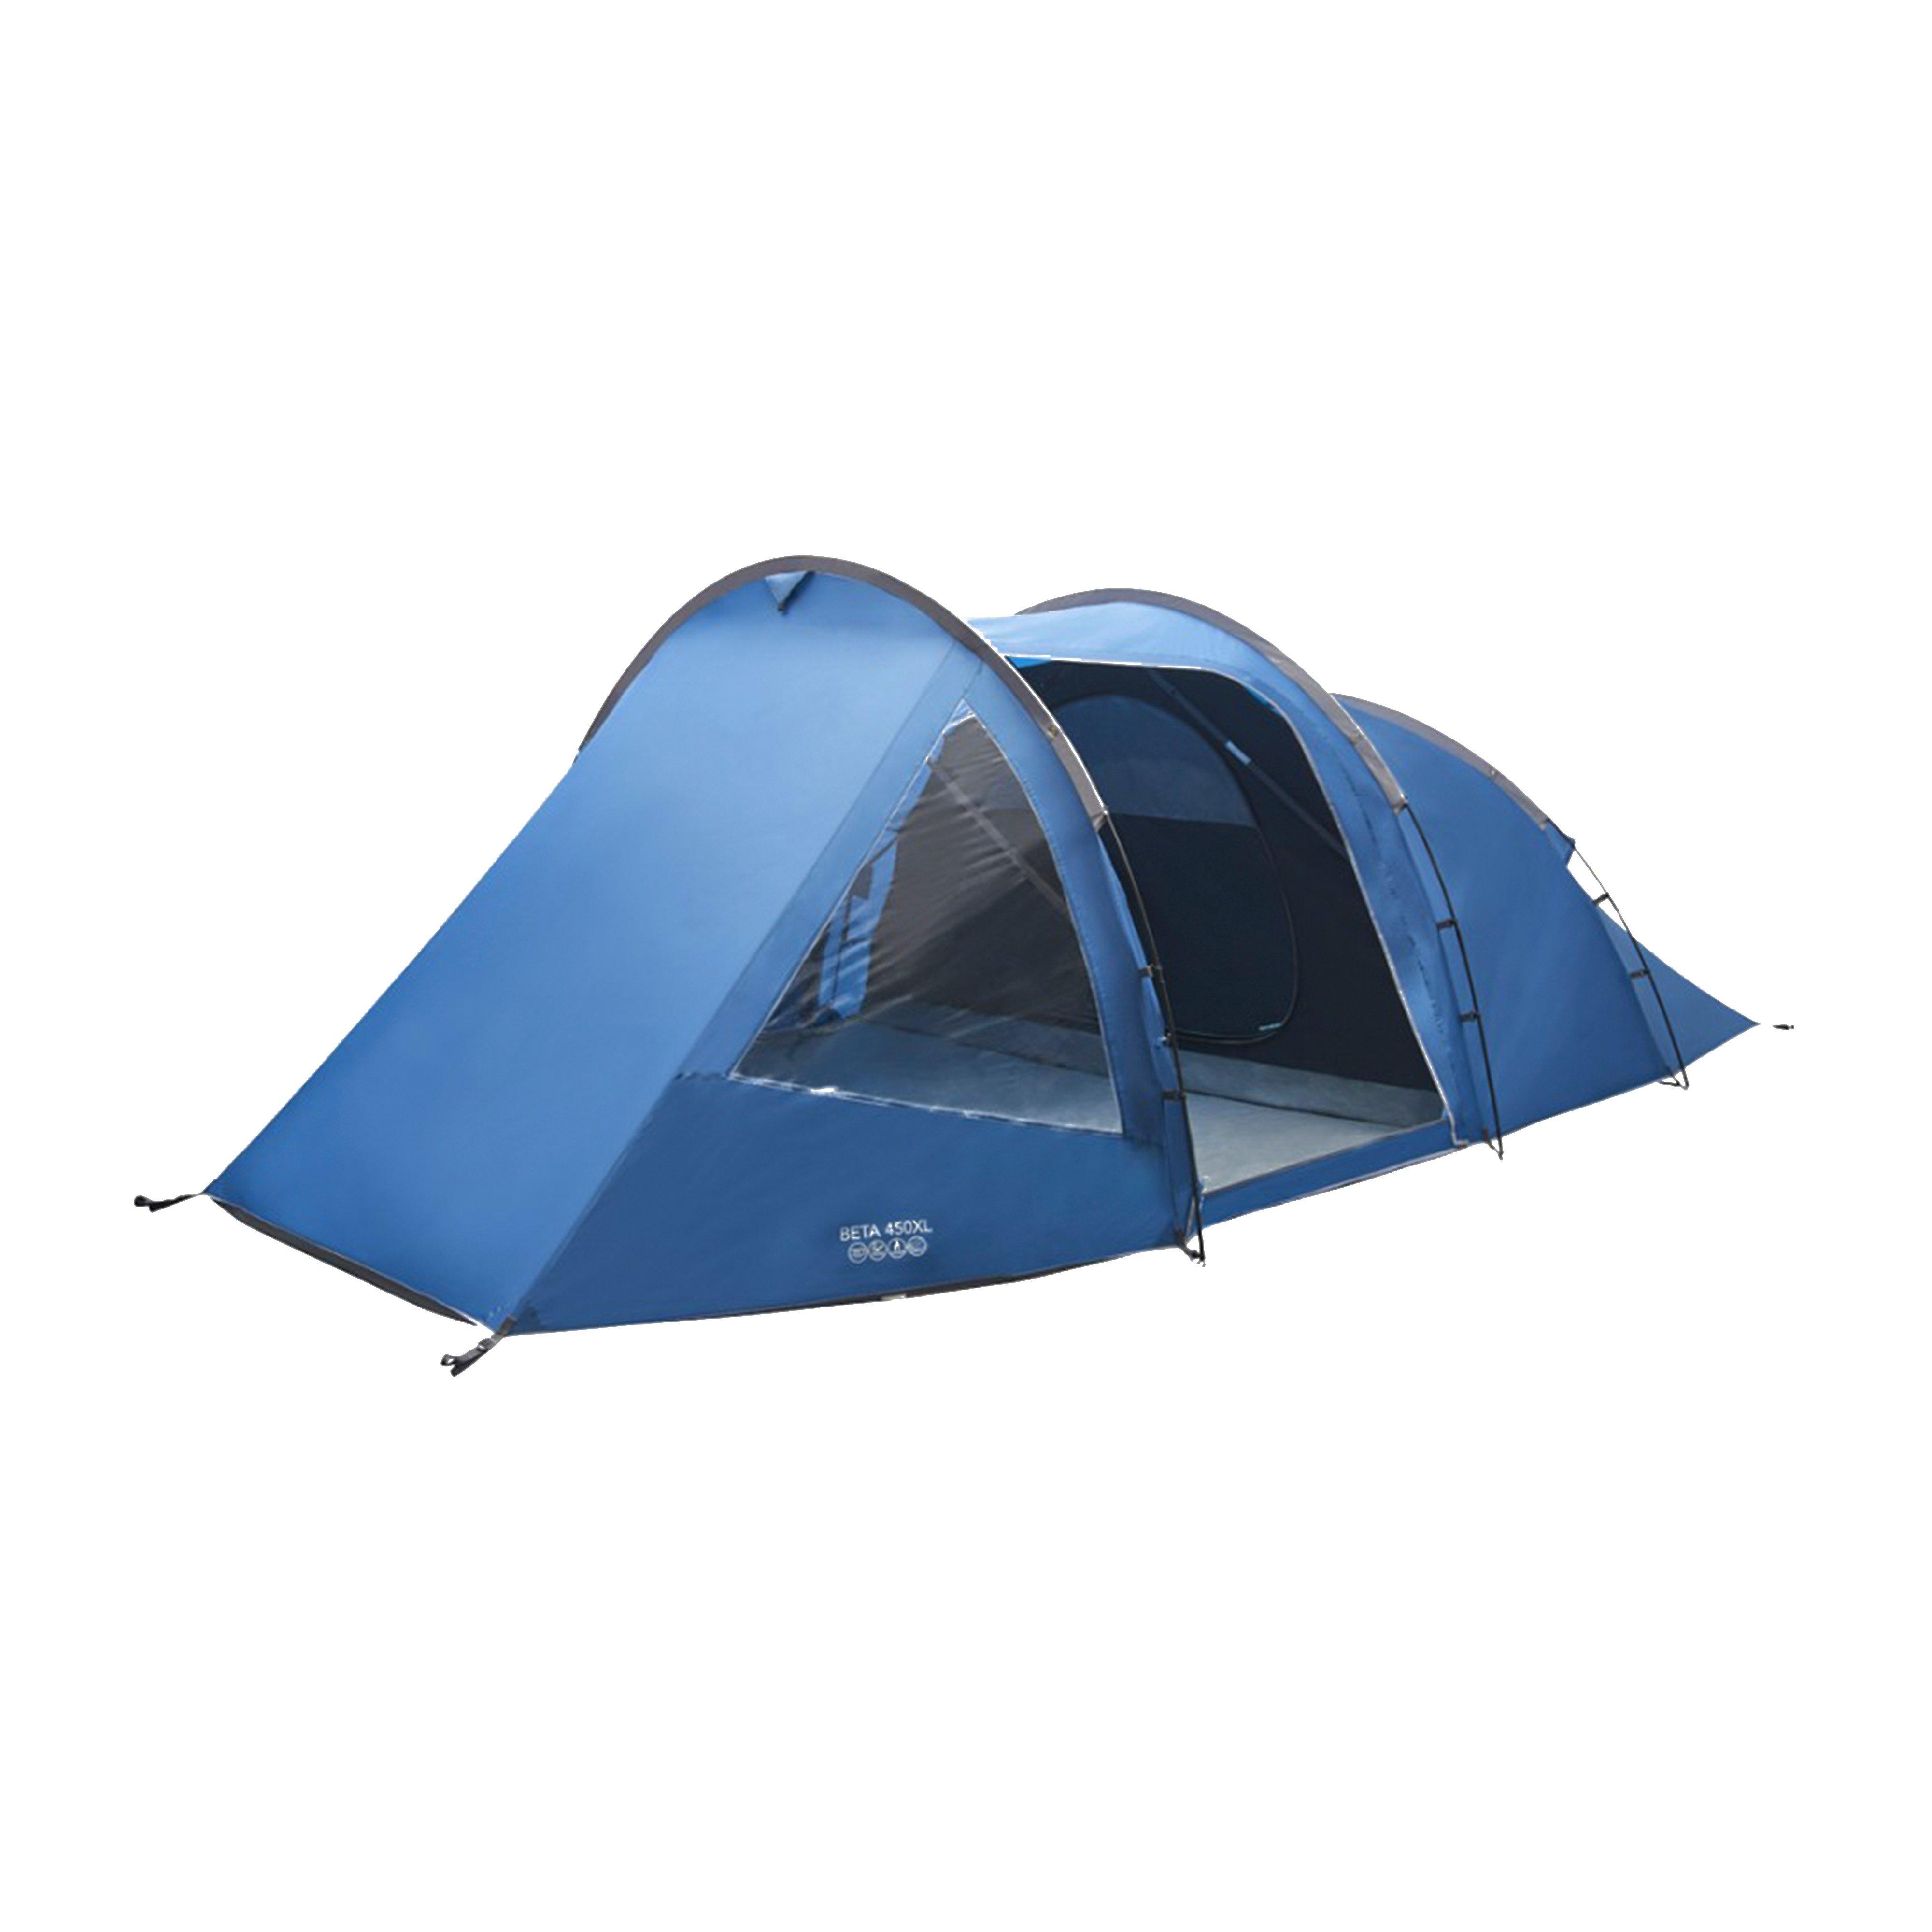 Vango Vango Beta 450XL Family Tent - Blue, Blue